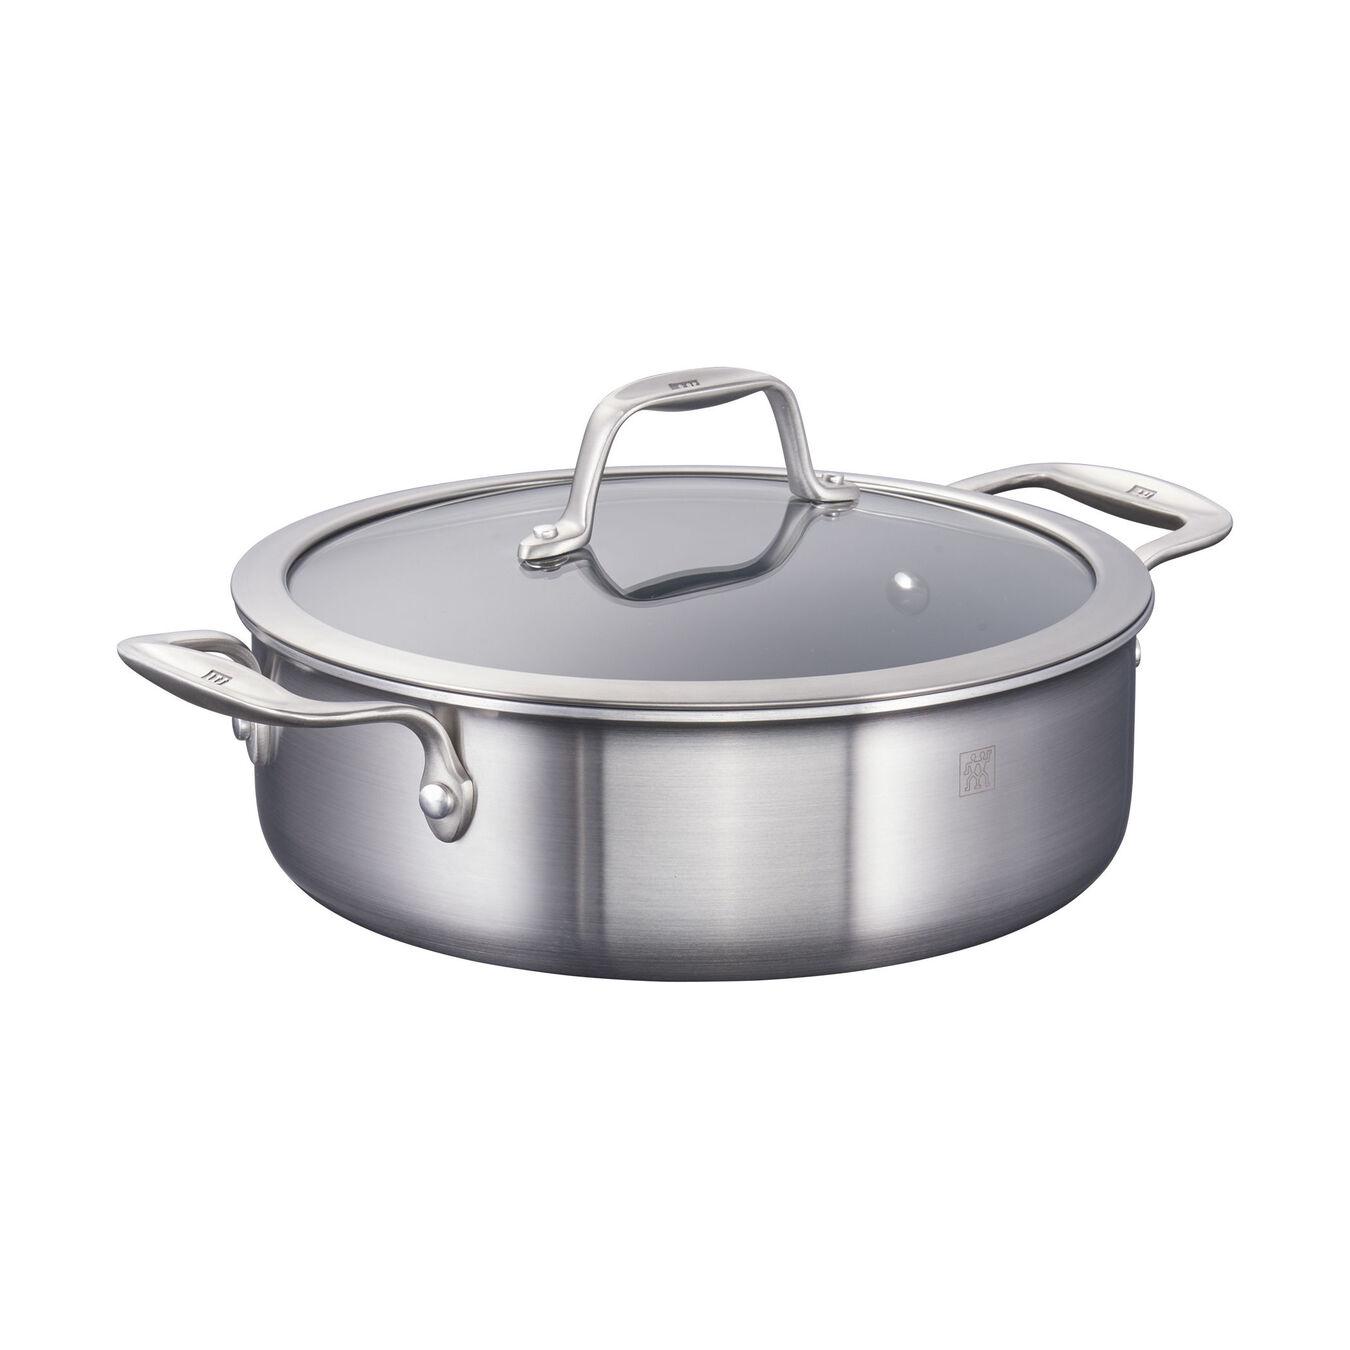 3-ply 6-pc Stainless Steel Ceramic Nonstick Breakfast Pan & Egg Poacher Set,,large 2